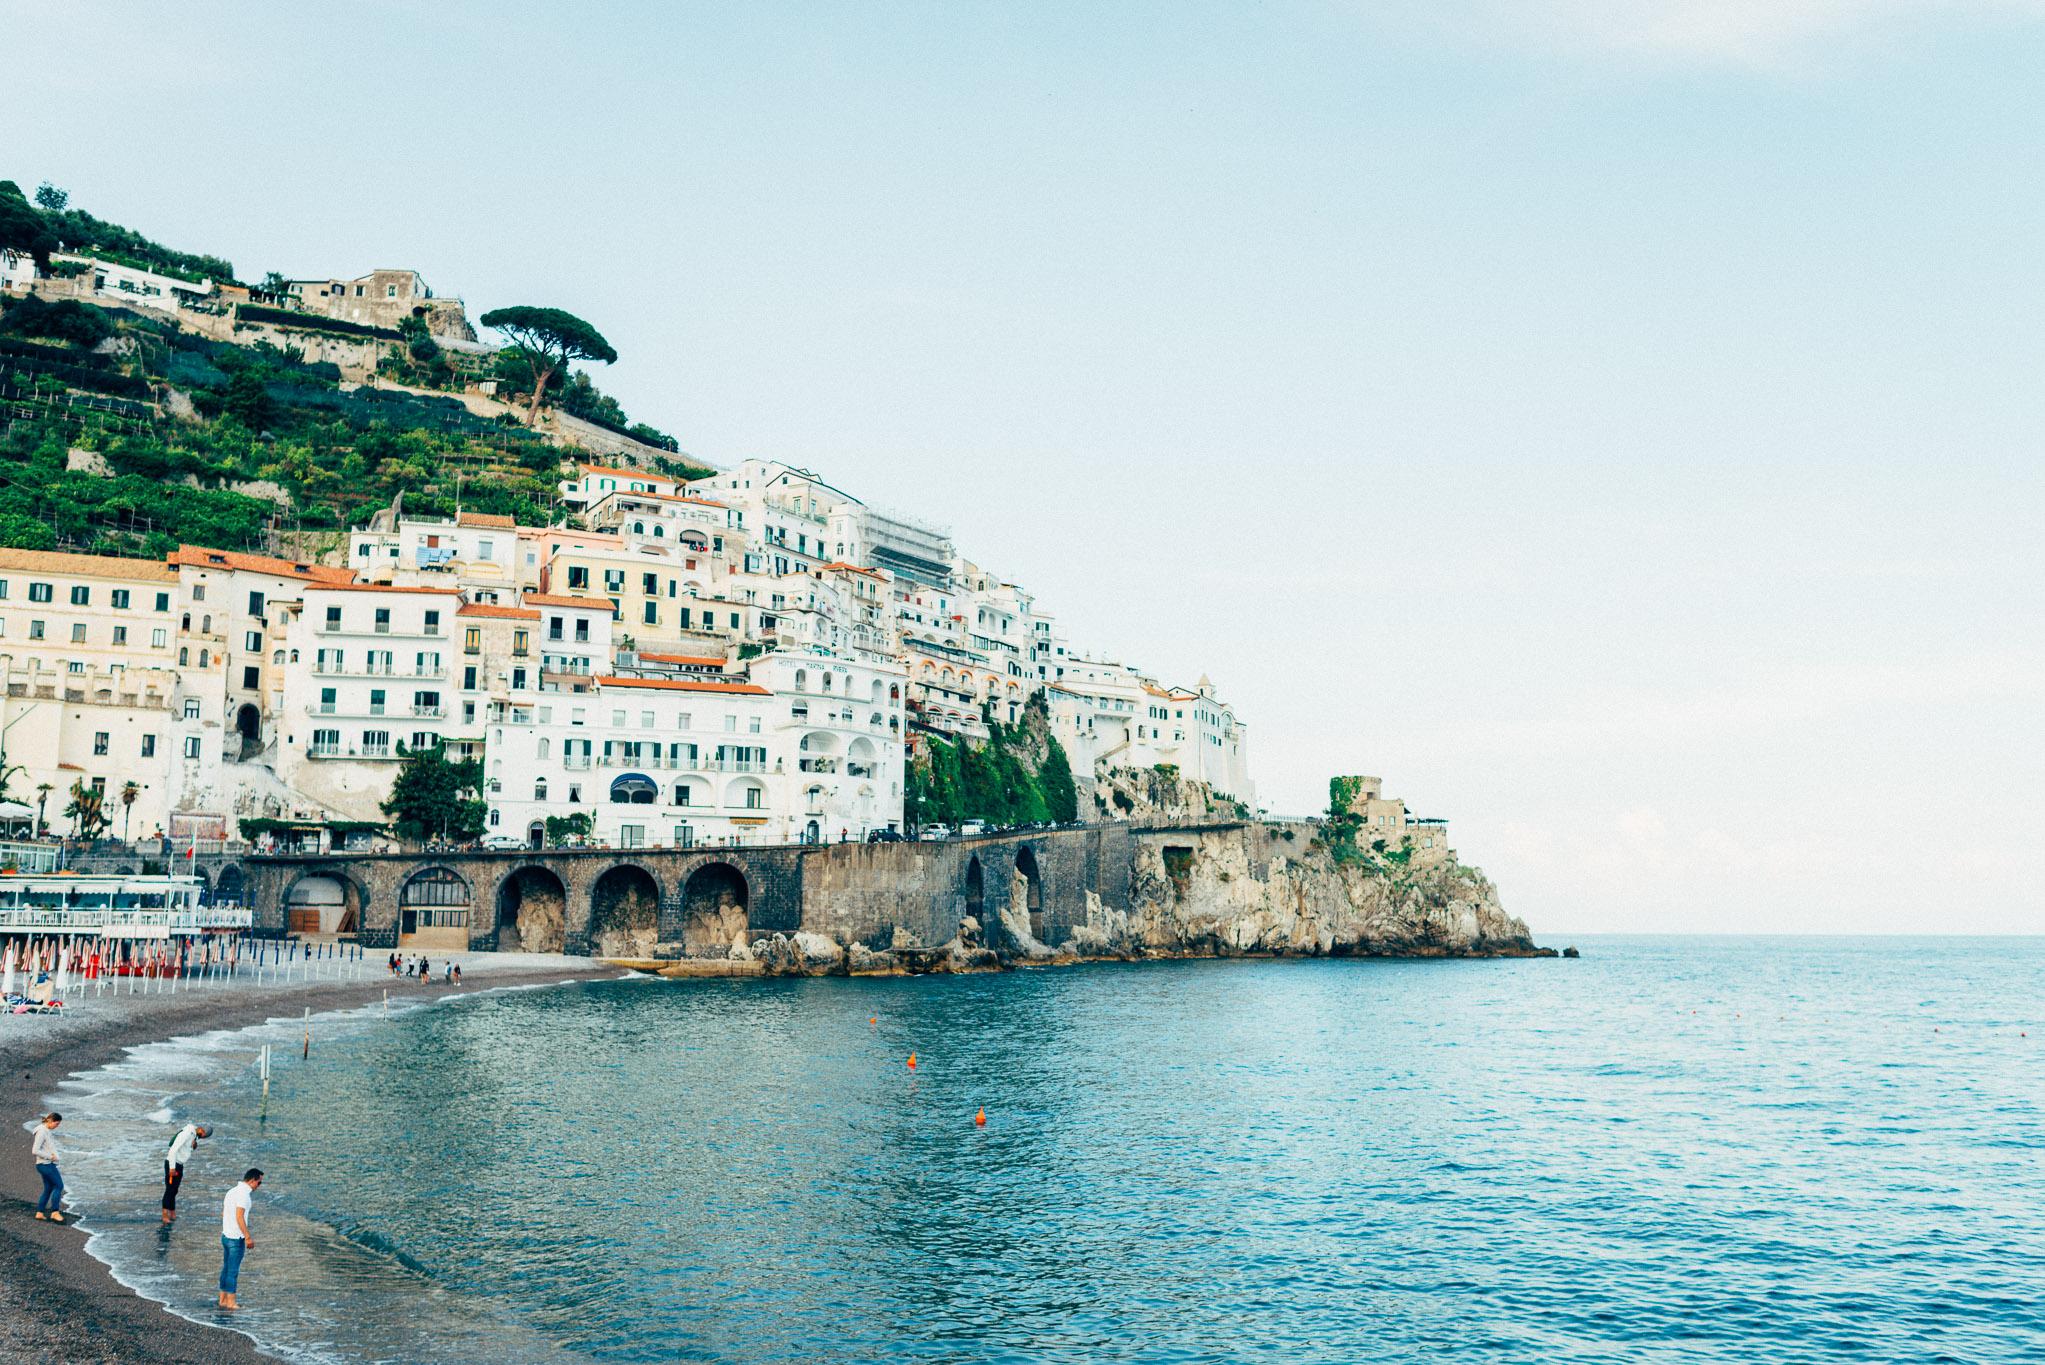 PJ Rankin_Drop in the Ocean_Italy-6.jpg